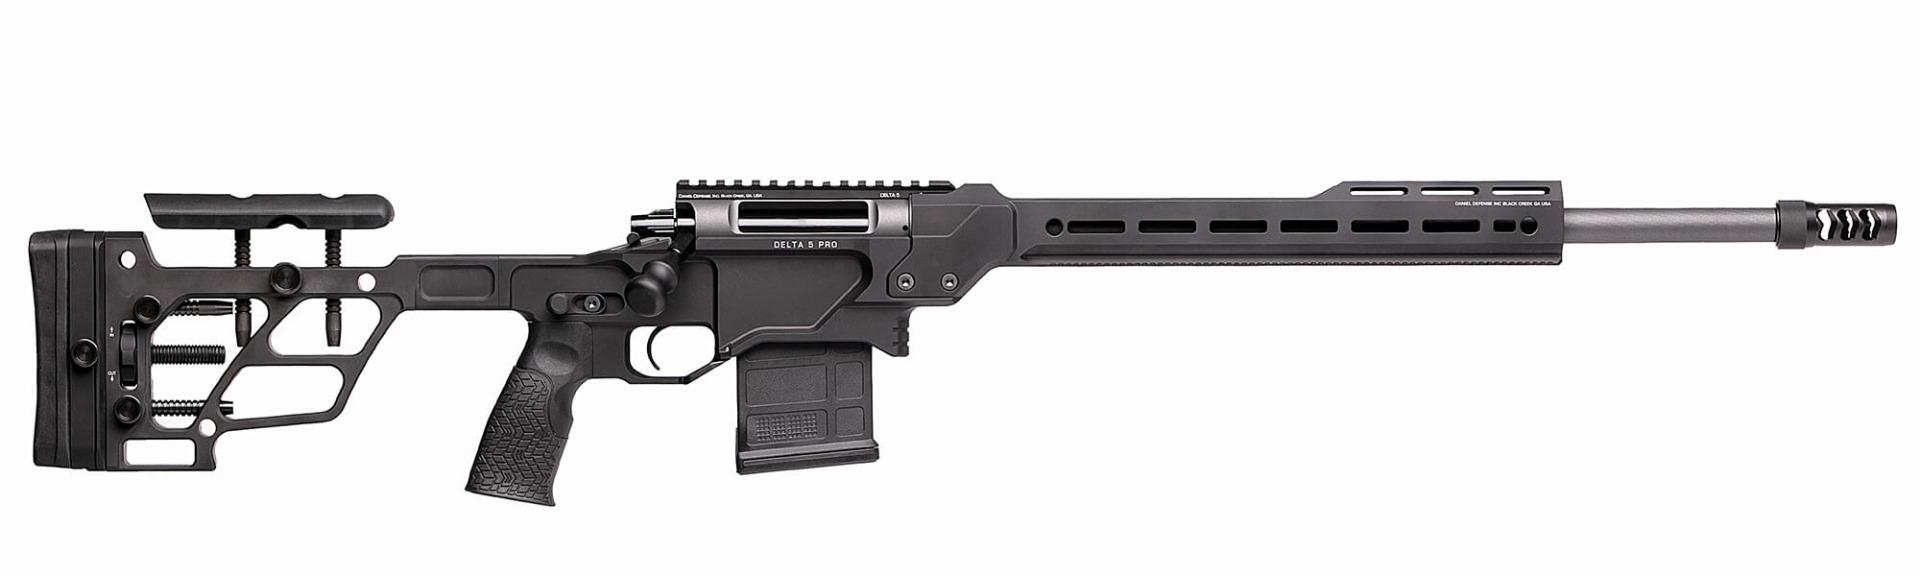 Delta 5 Pro Black